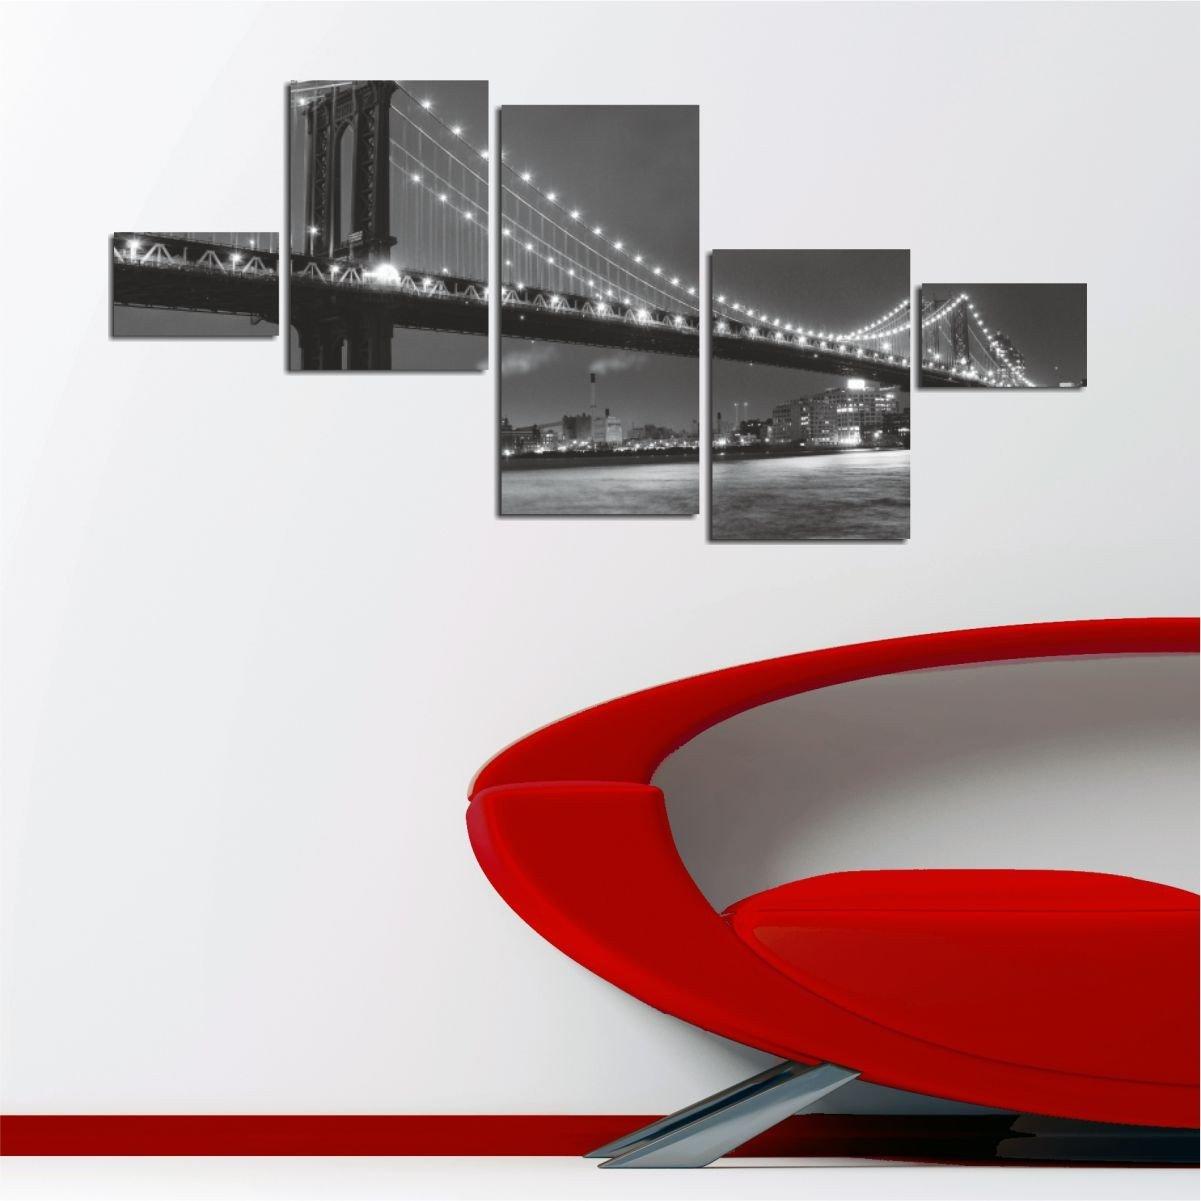 LaModaHome Decorative 100% MDF Wall Art 5 Panels (22'' x 9.4'' Total) Ready to Hang Painting Night Light Bridge Structure Brooklyn America Sea